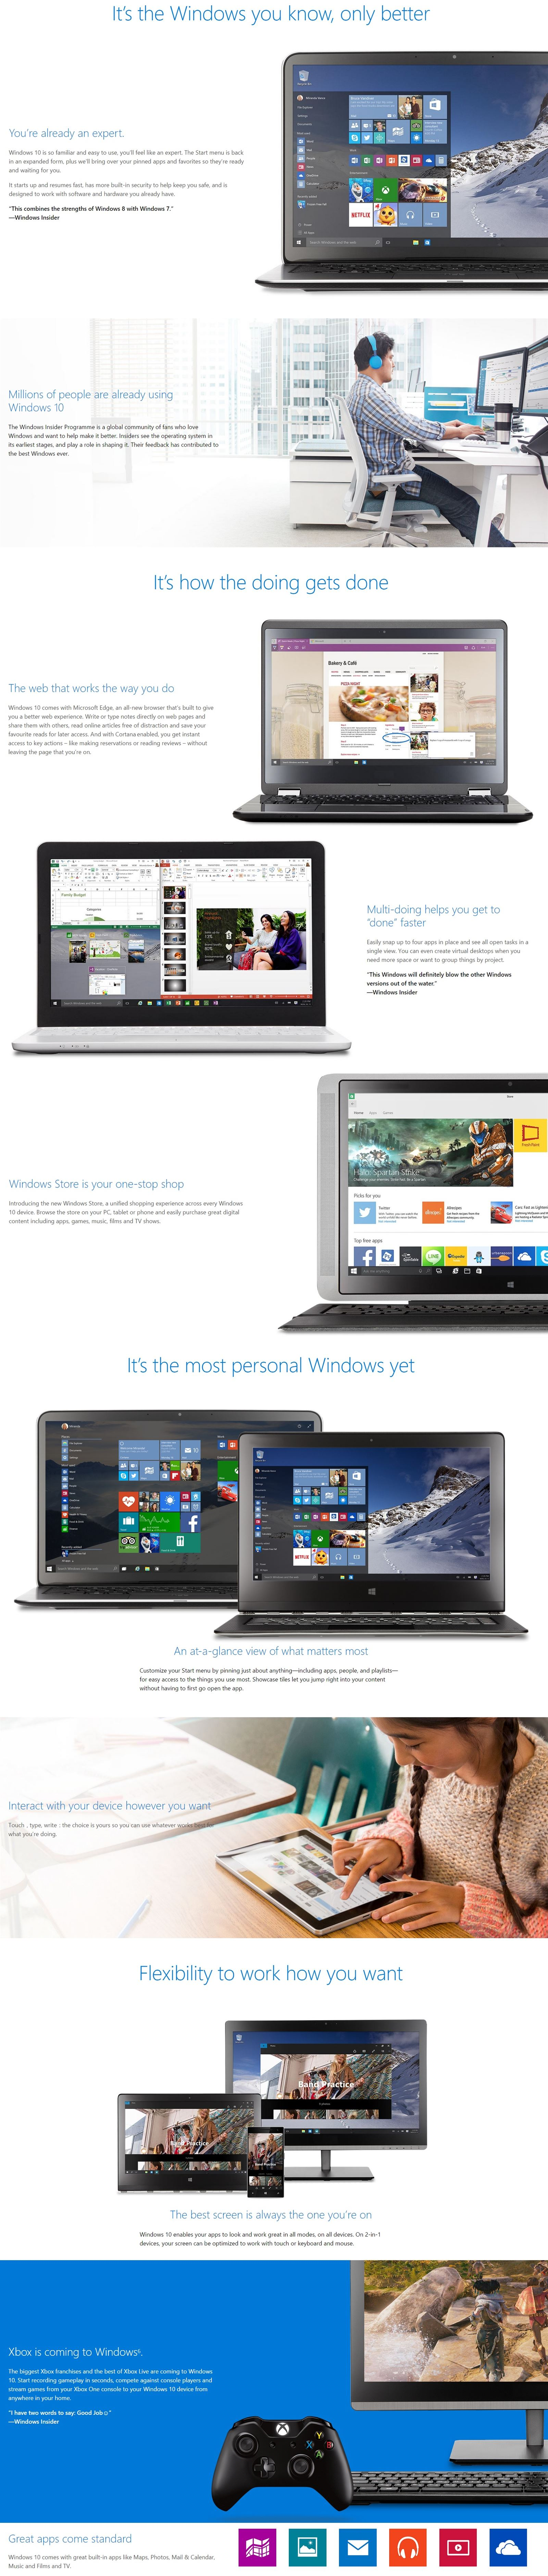 Microsoft Windows 10 Home 64-Bit OEM With DVD - English